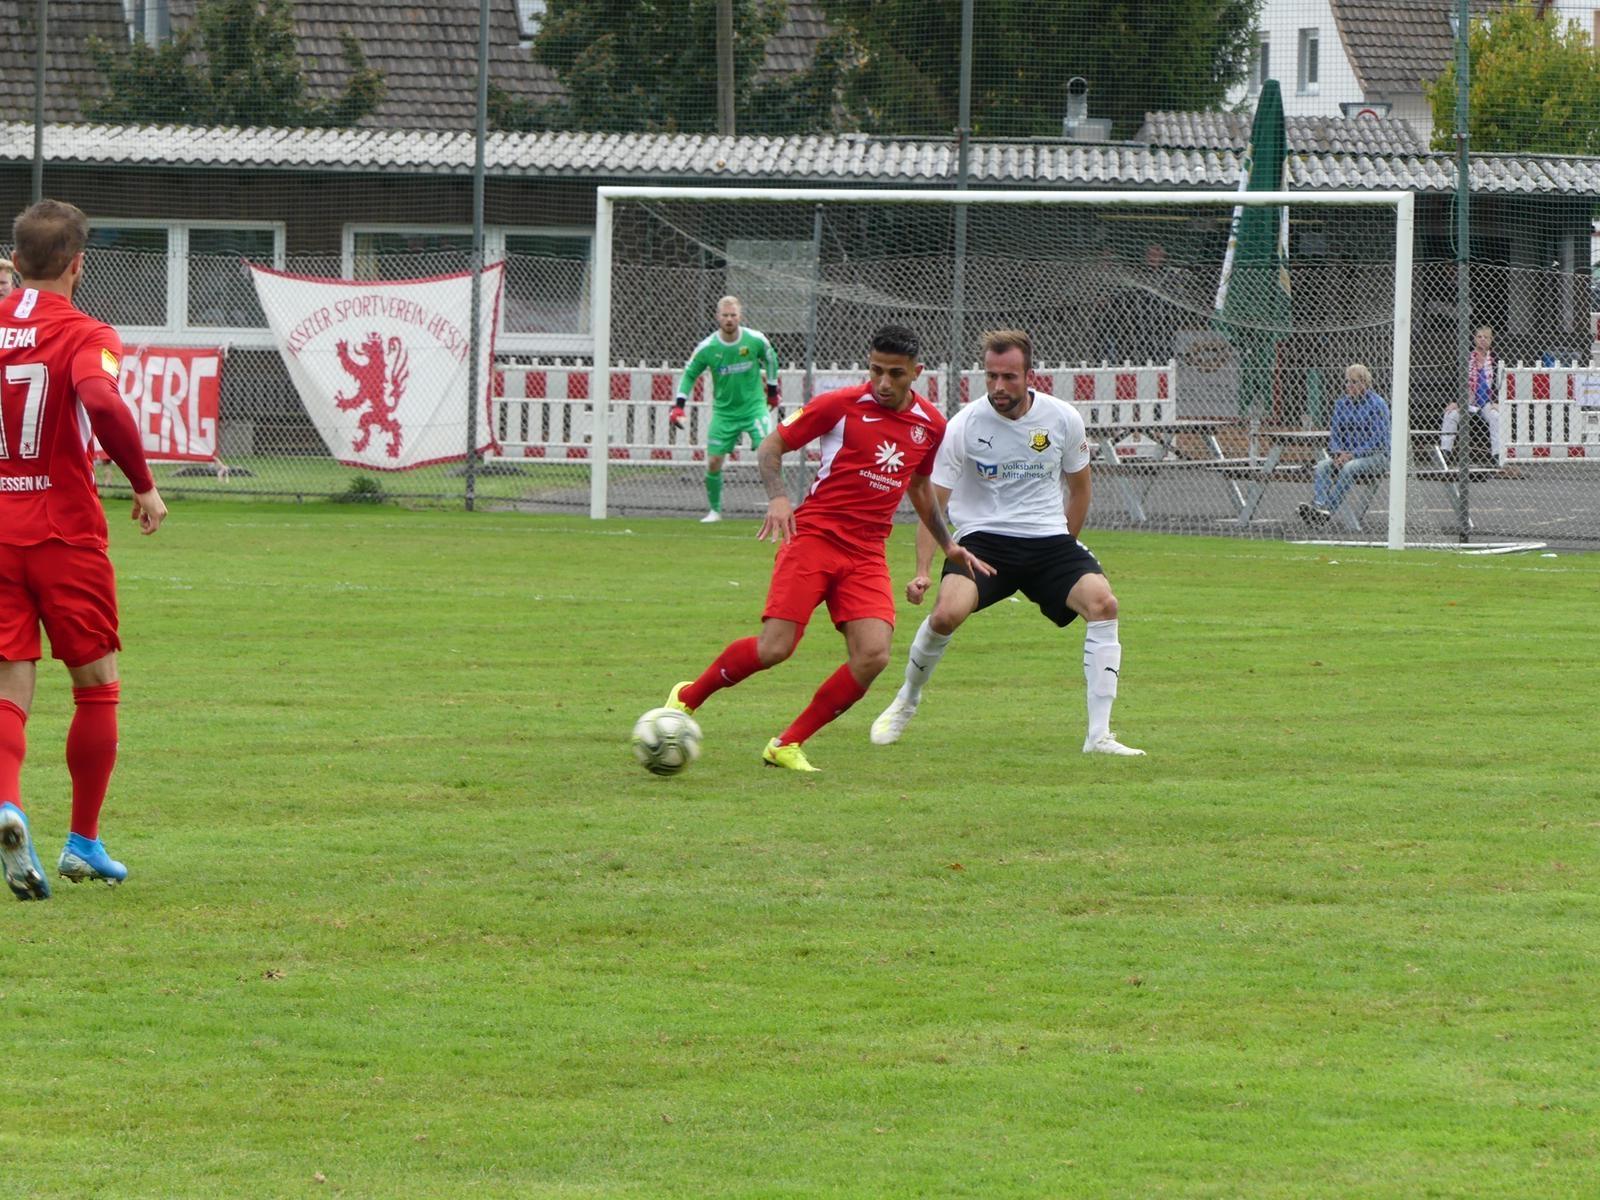 FSV Fernwald, KSV Hessen Kassel